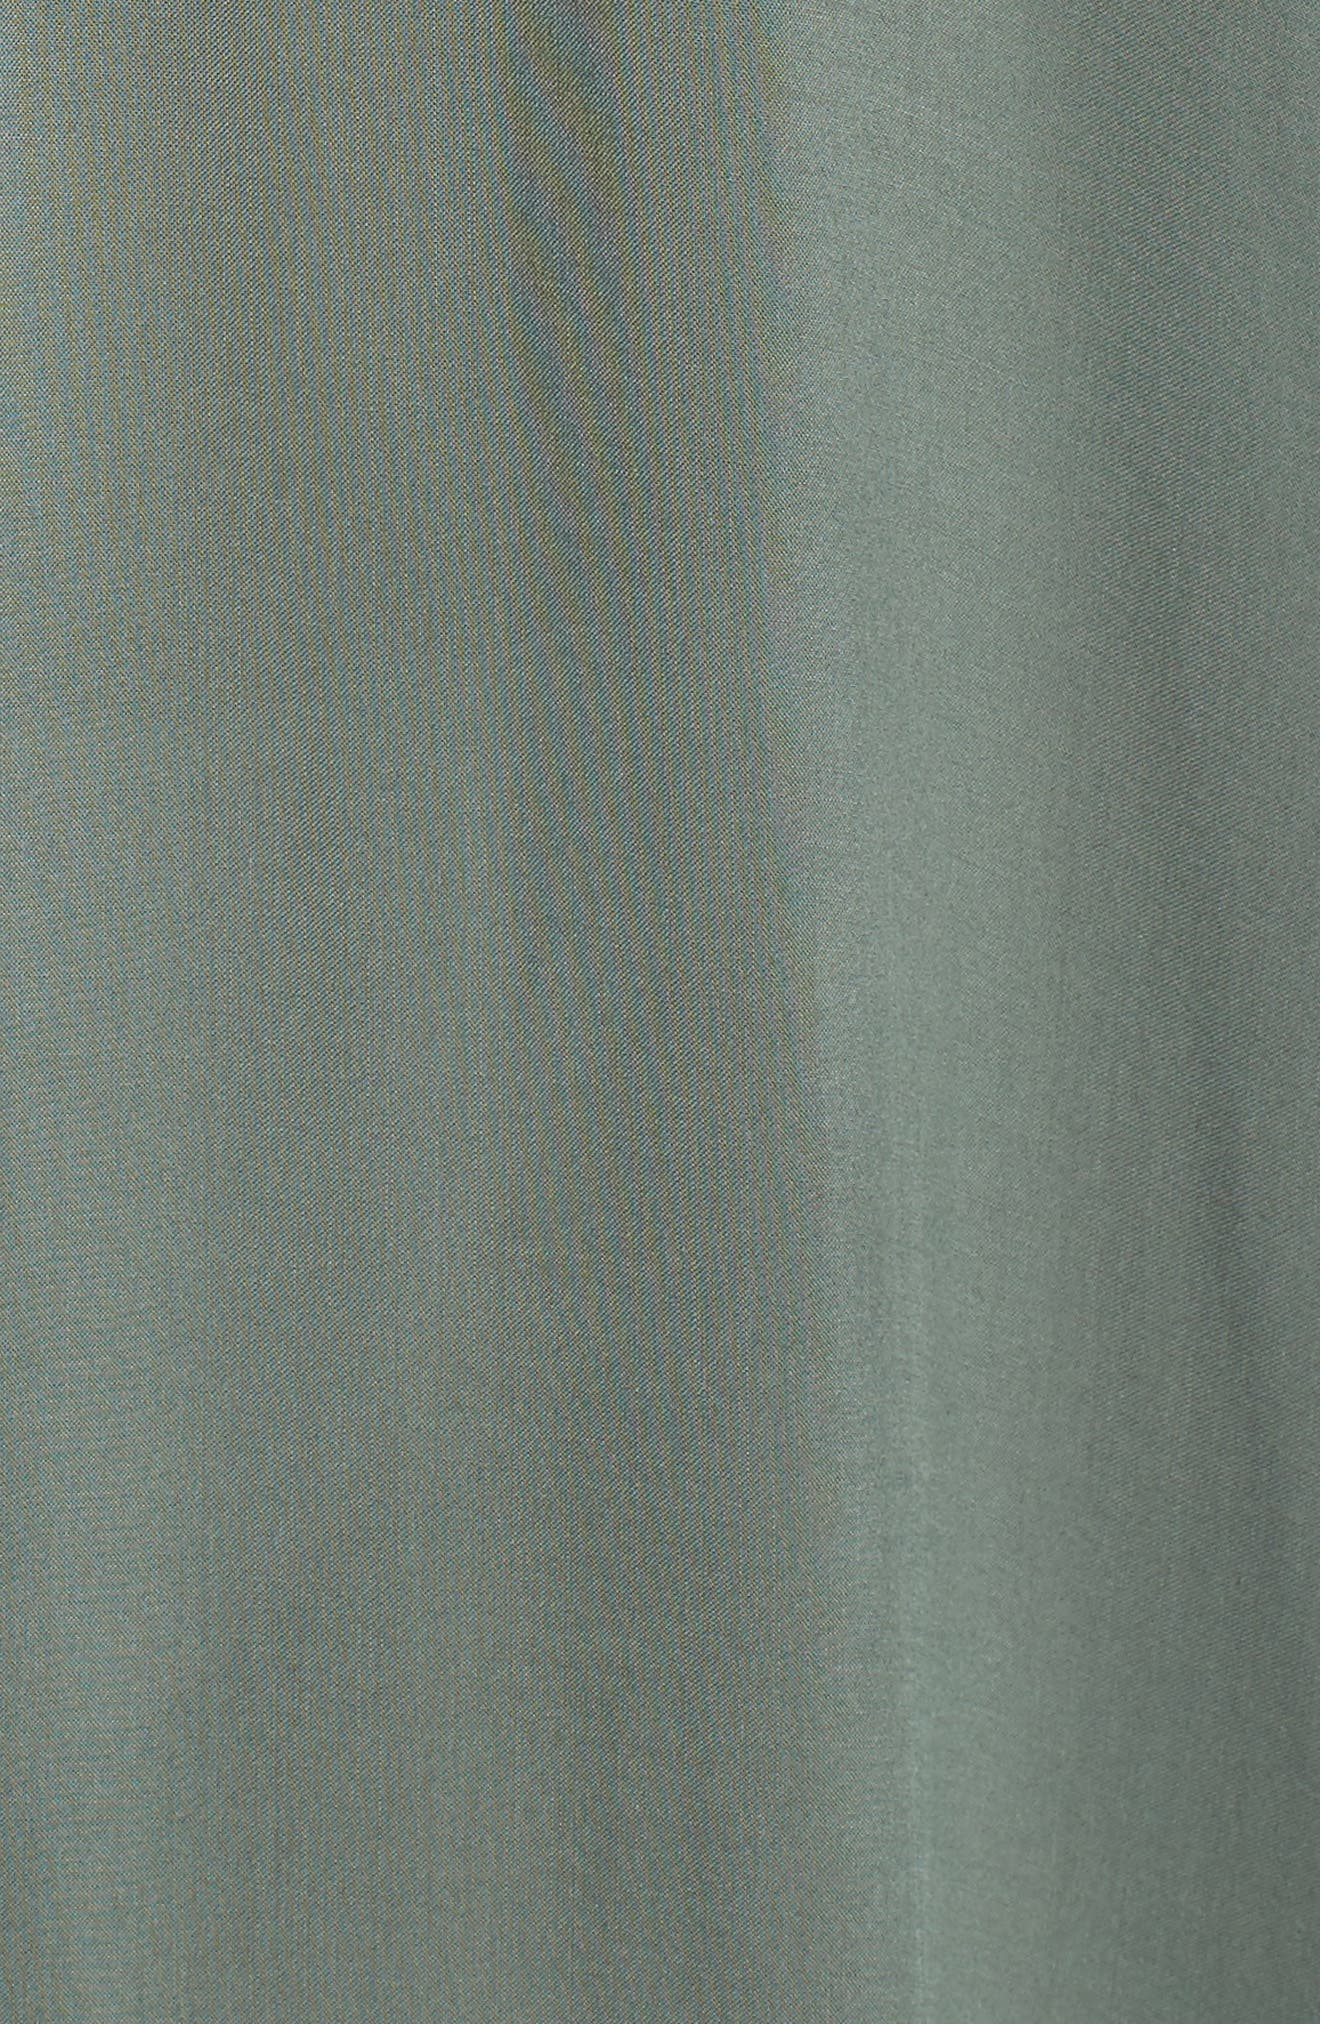 Cover-Up Maxi Dress,                             Alternate thumbnail 32, color,